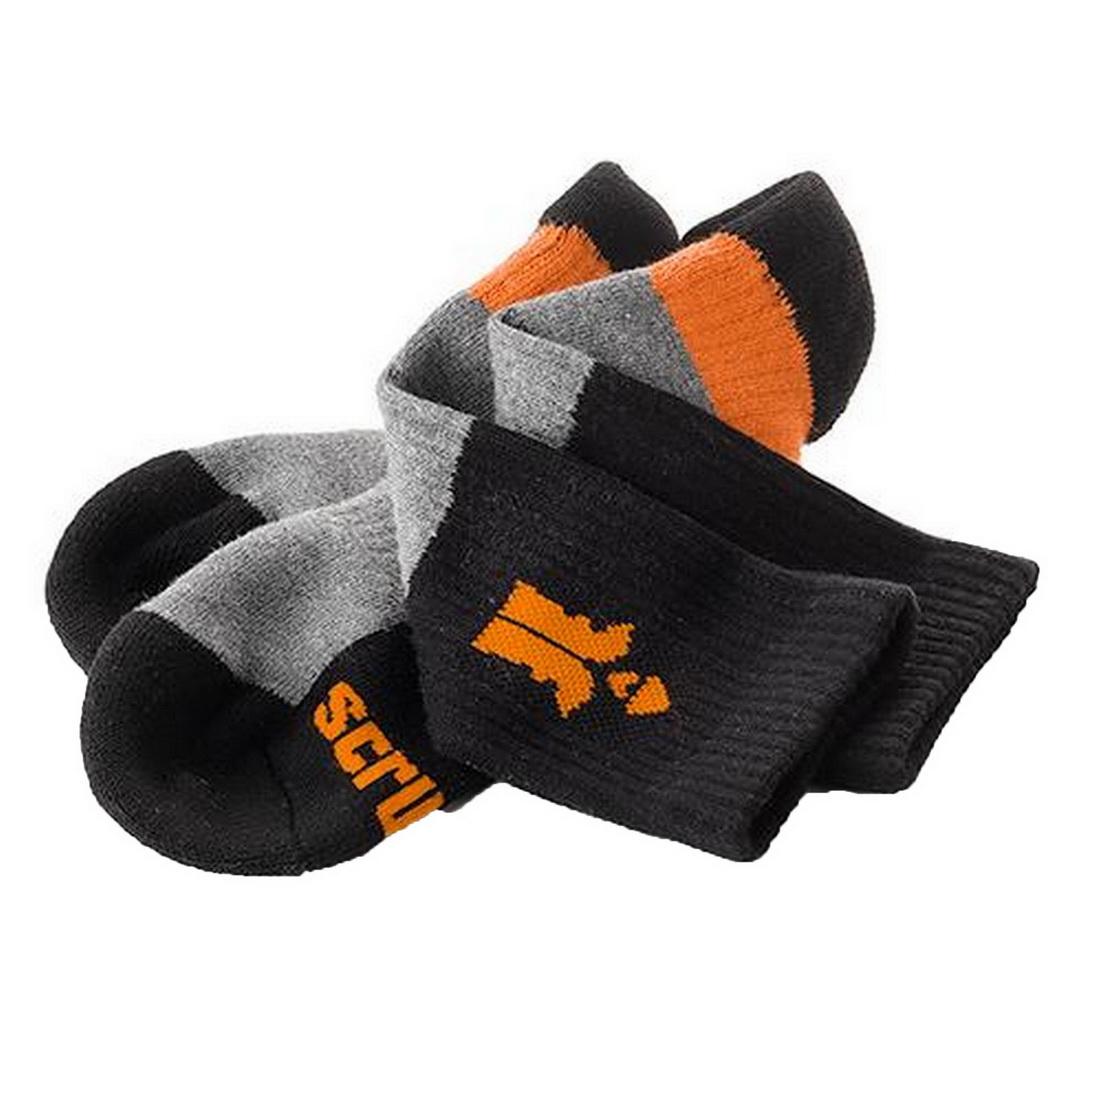 Trade Series Work Socks UK10-13 Black/Orange T53548